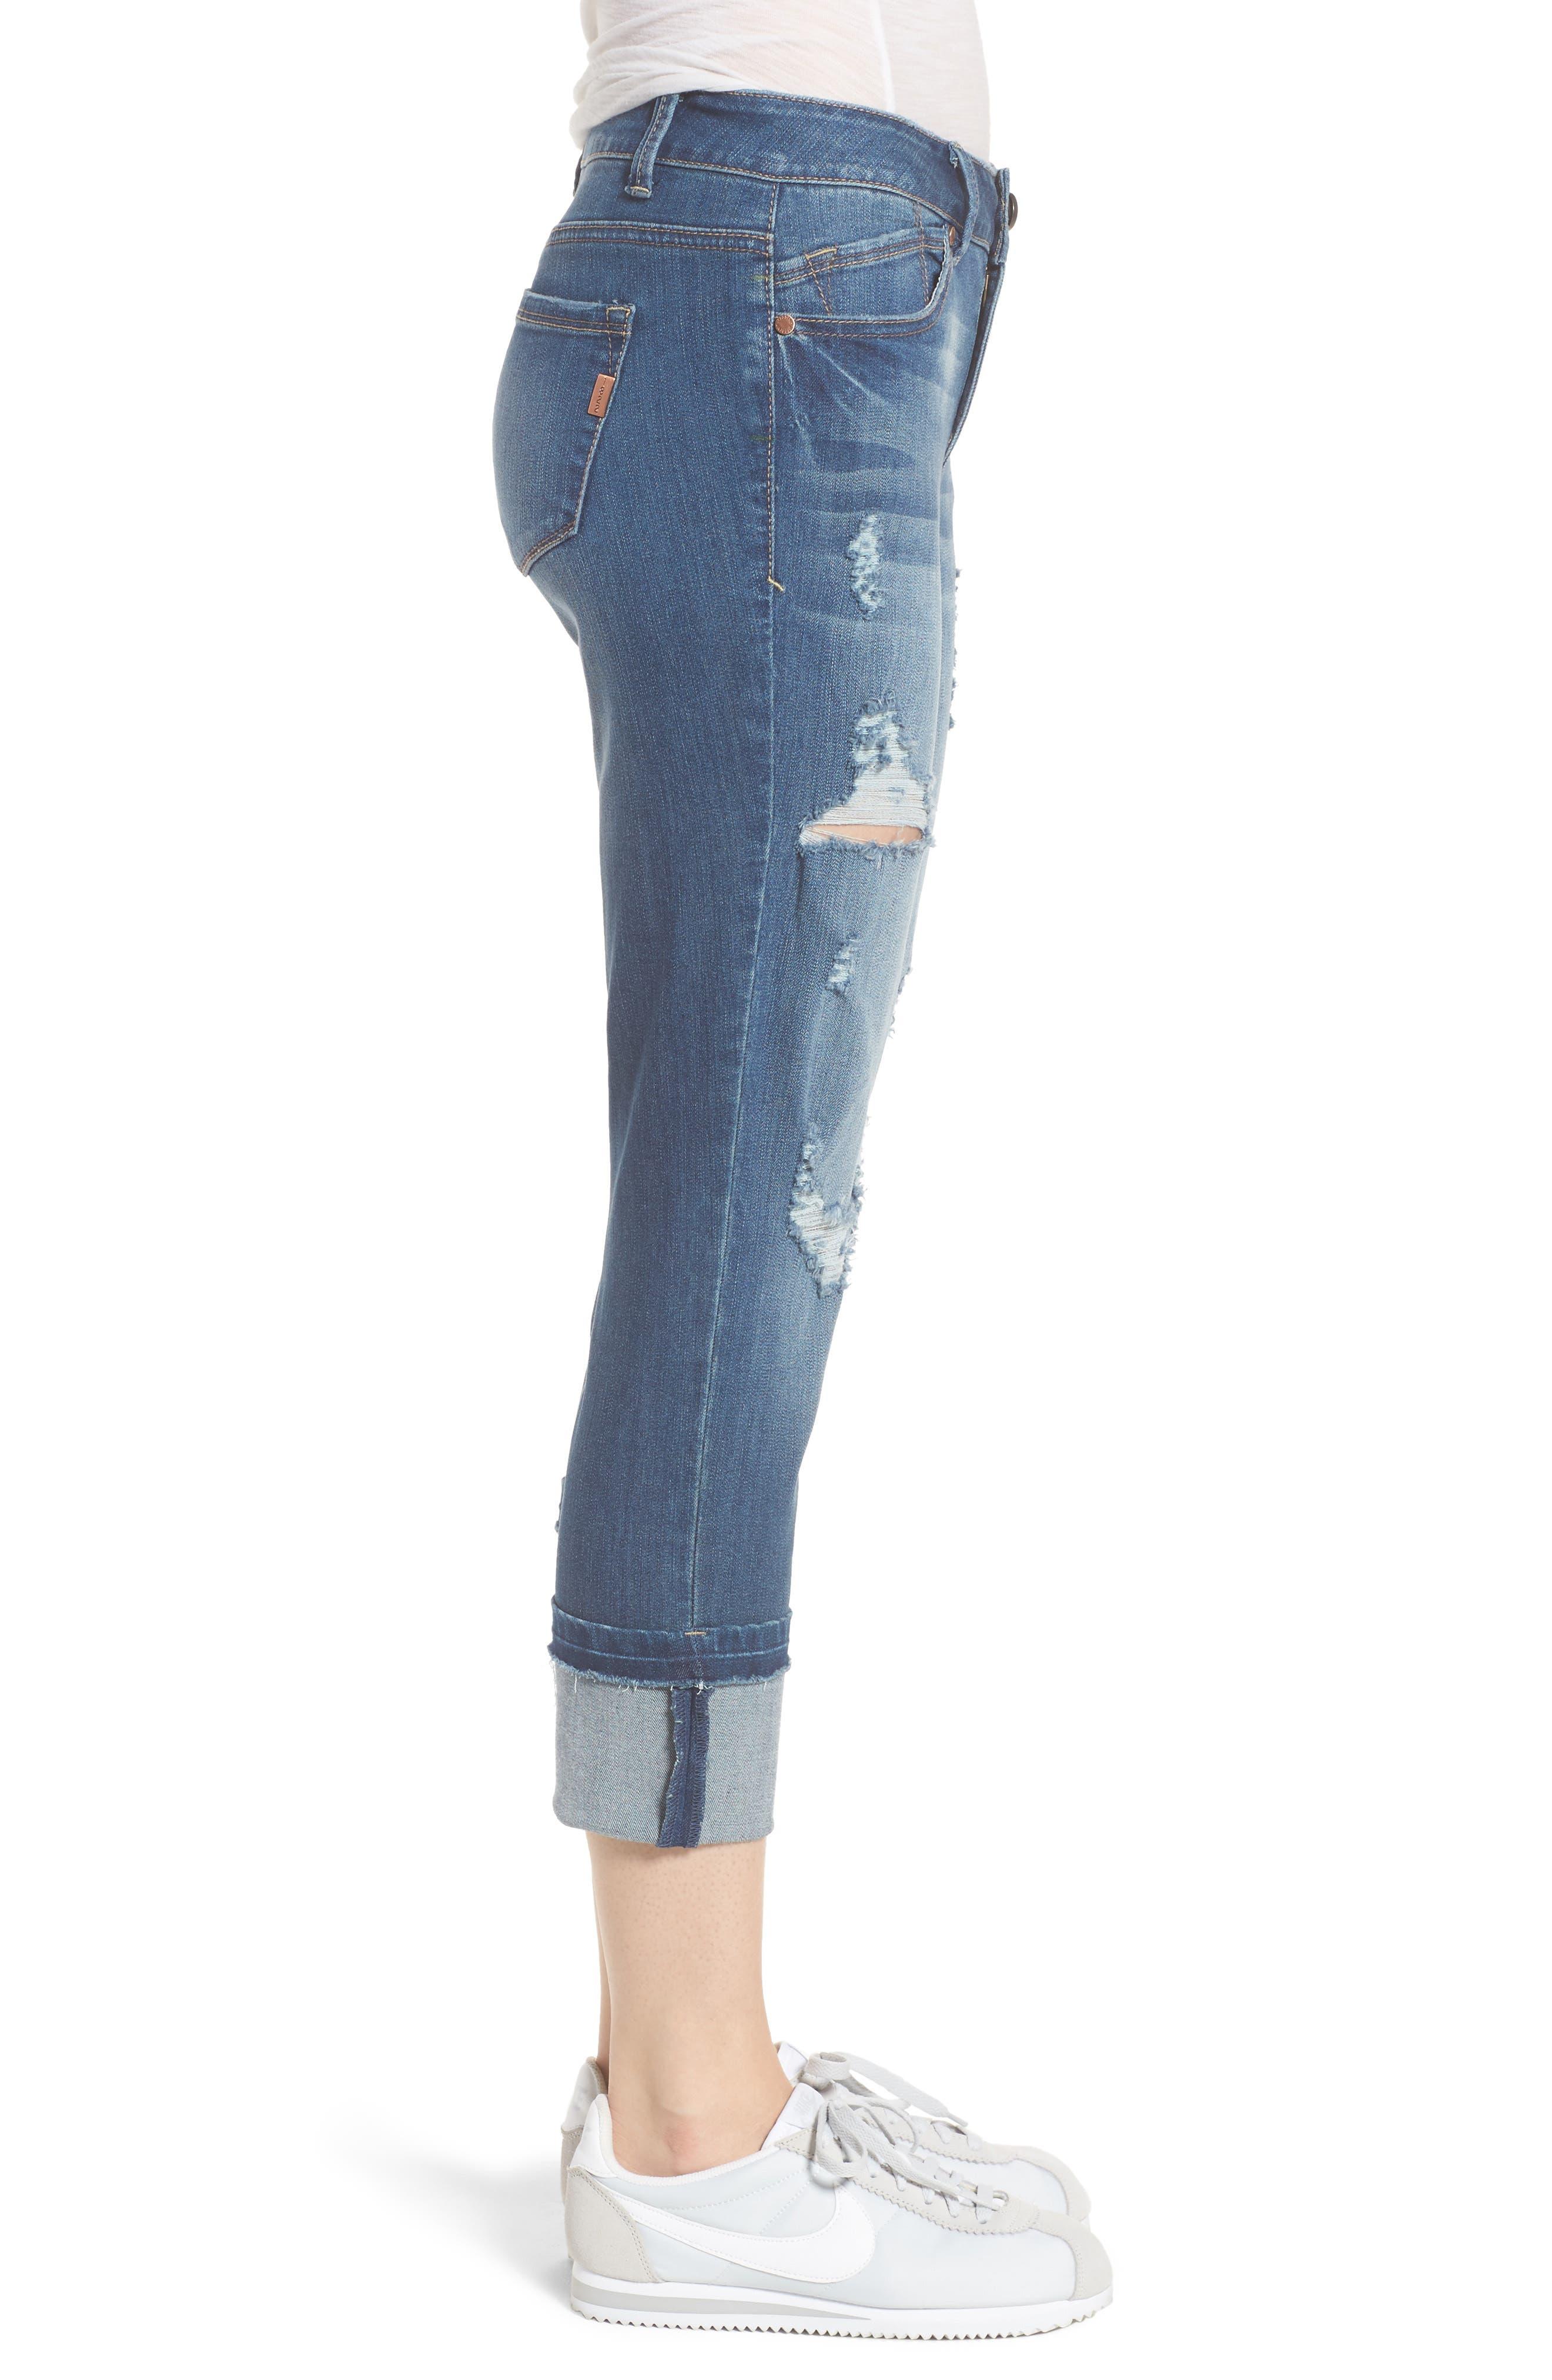 Decon Cuffed Skinny Jeans,                             Alternate thumbnail 3, color,                             Dedra